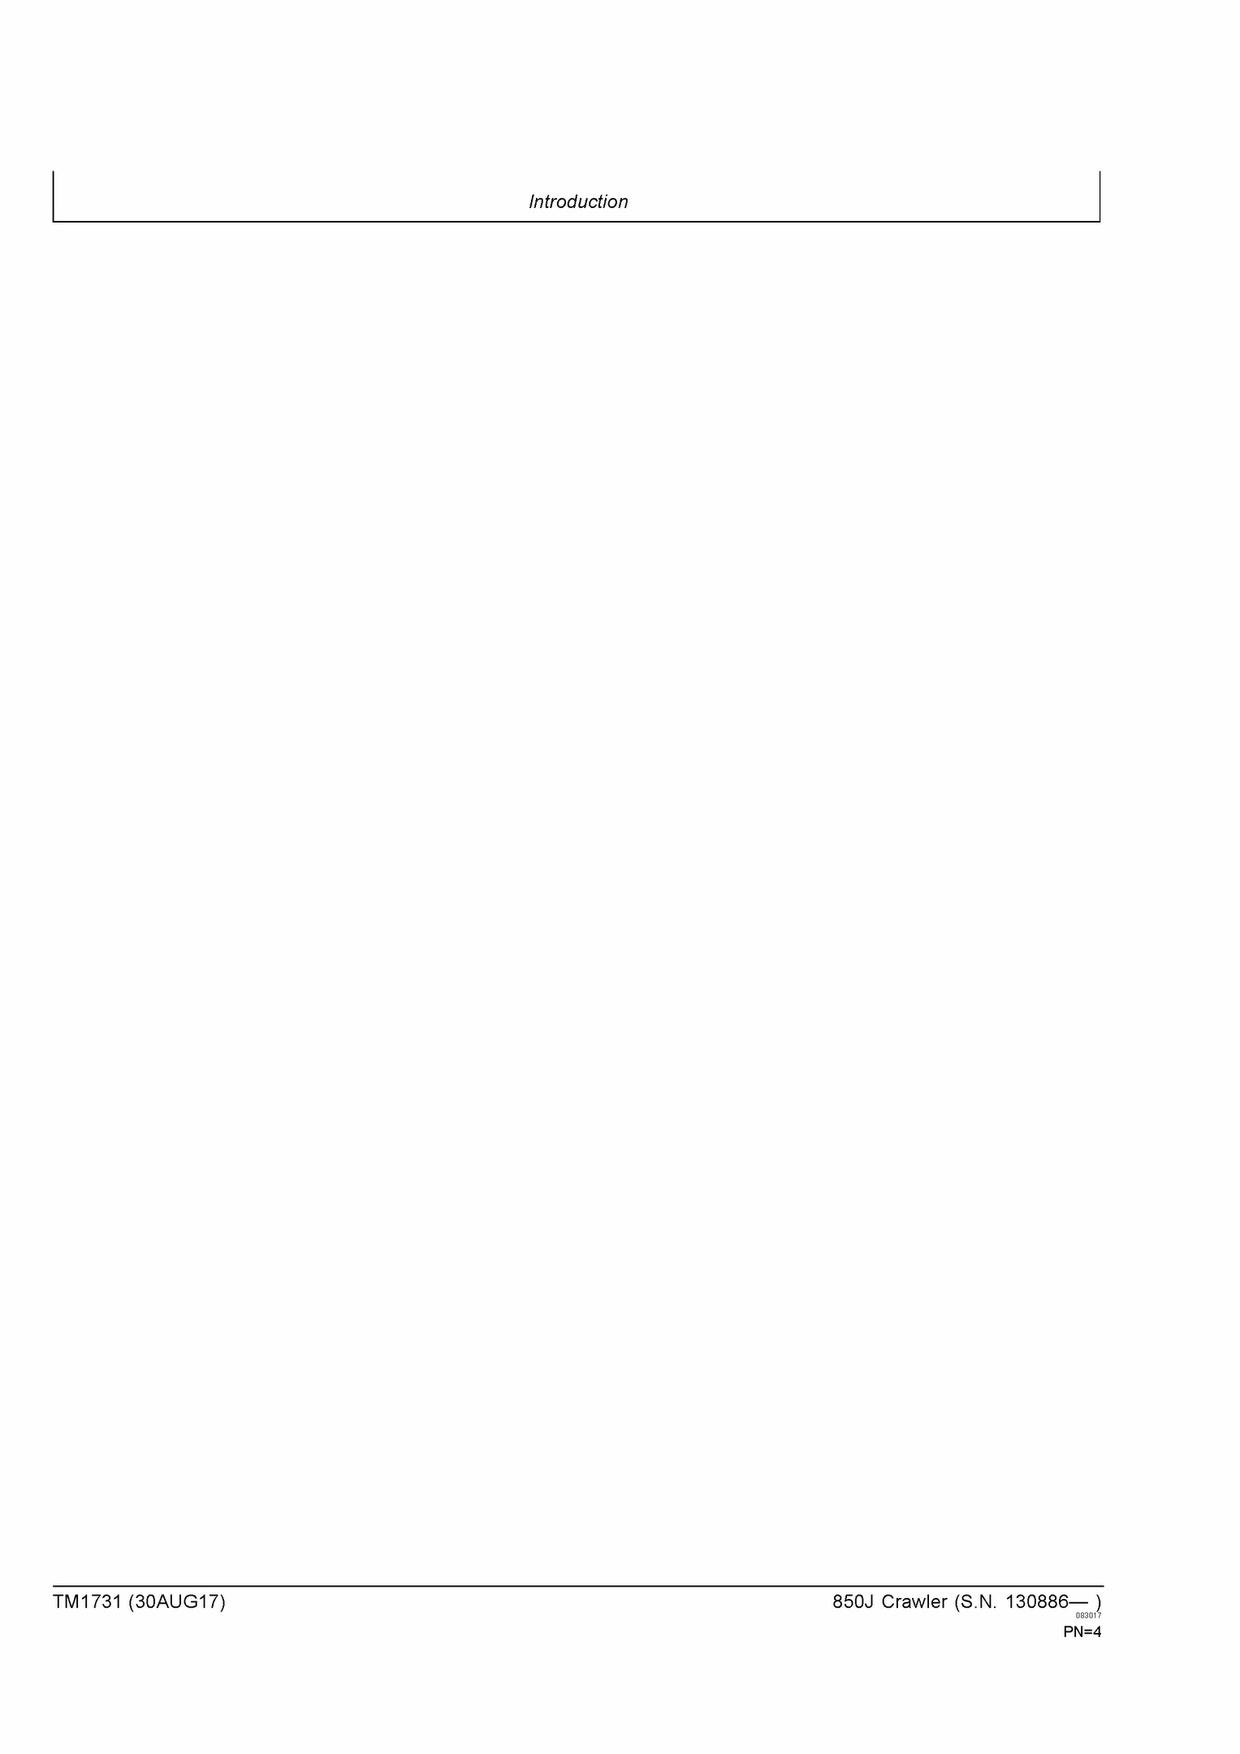 JOHN DEERE 850J CRAWLER DOZER REPAIR SERVICE TECHNICAL MANUAL TM1731